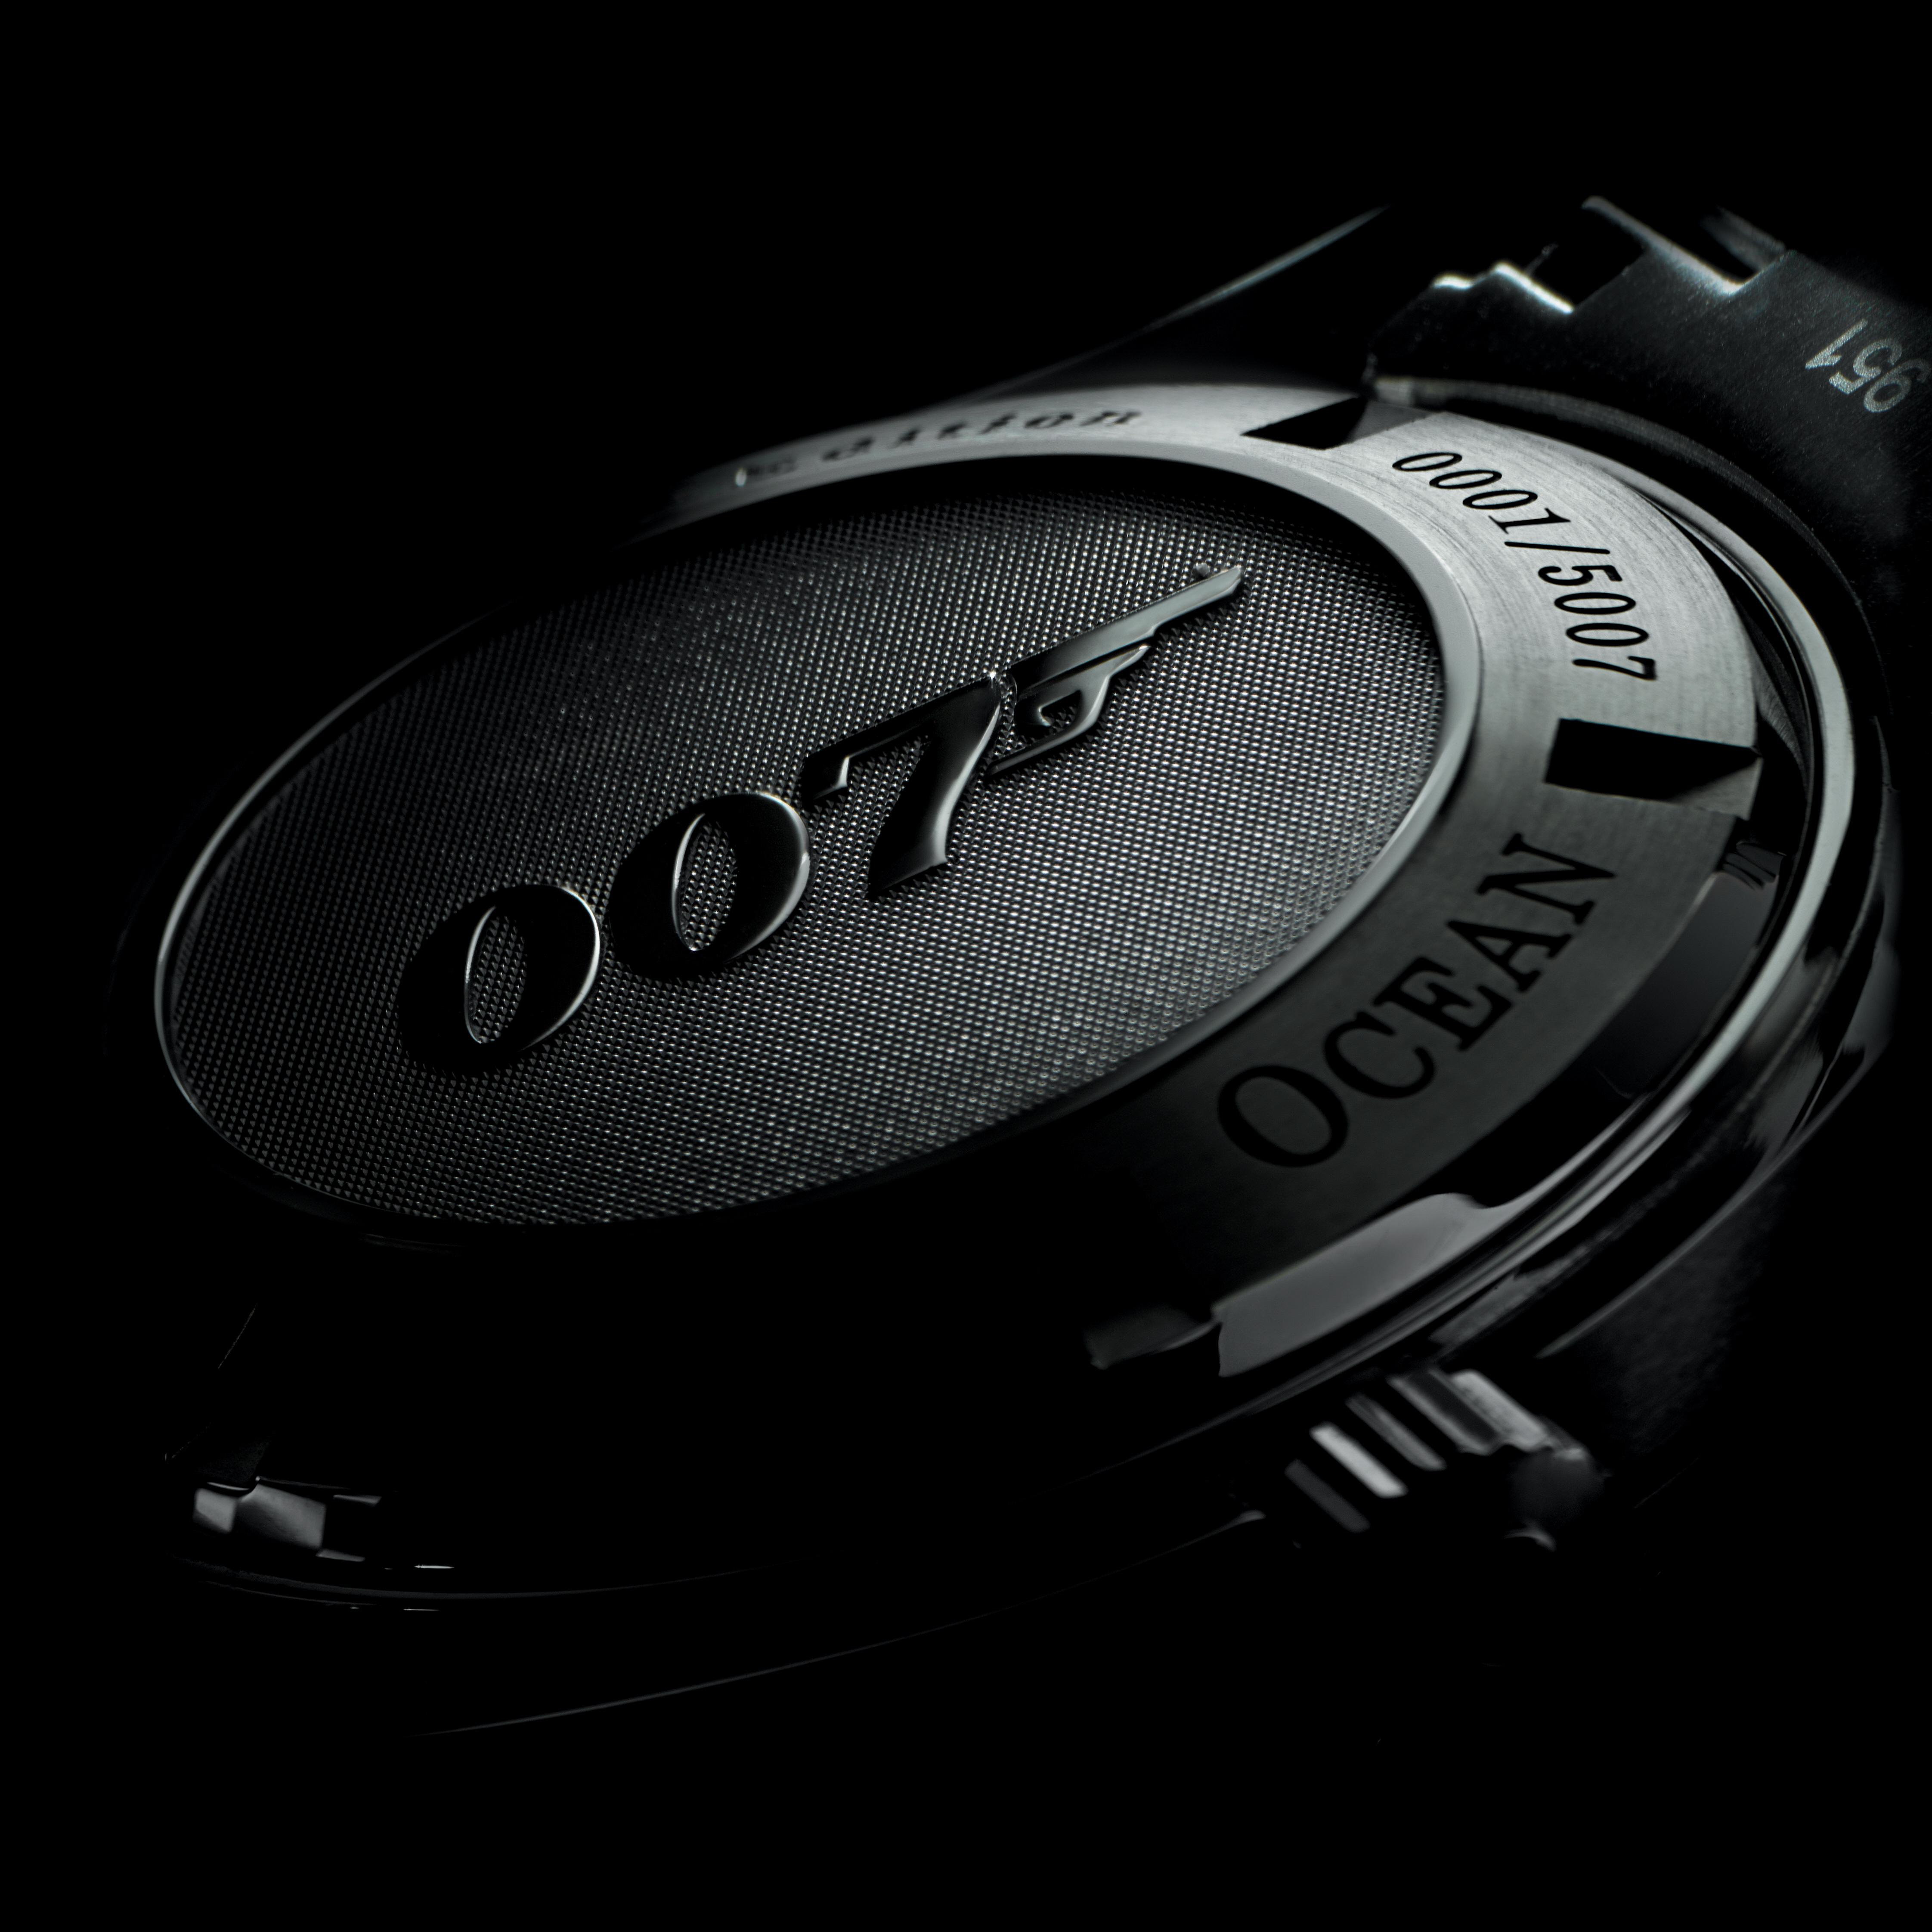 Quantum Of Solace James Bond Limited Edition Planet Ocean 455mm 4488x4488